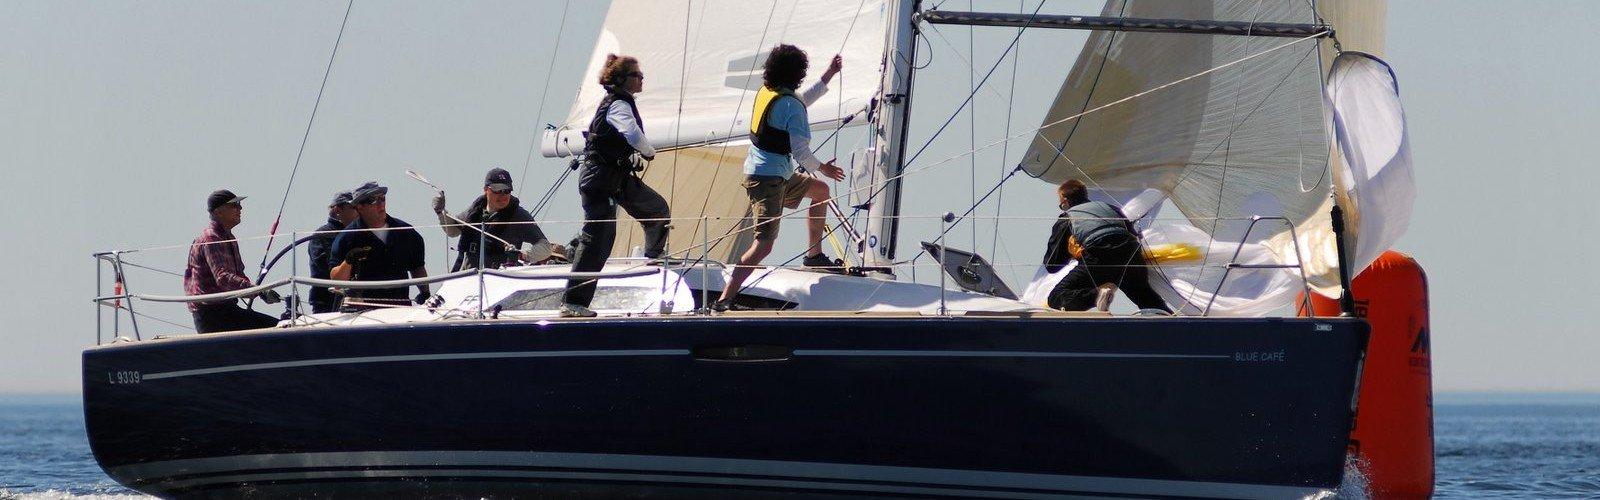 Bedrijfsuitje Company sailing